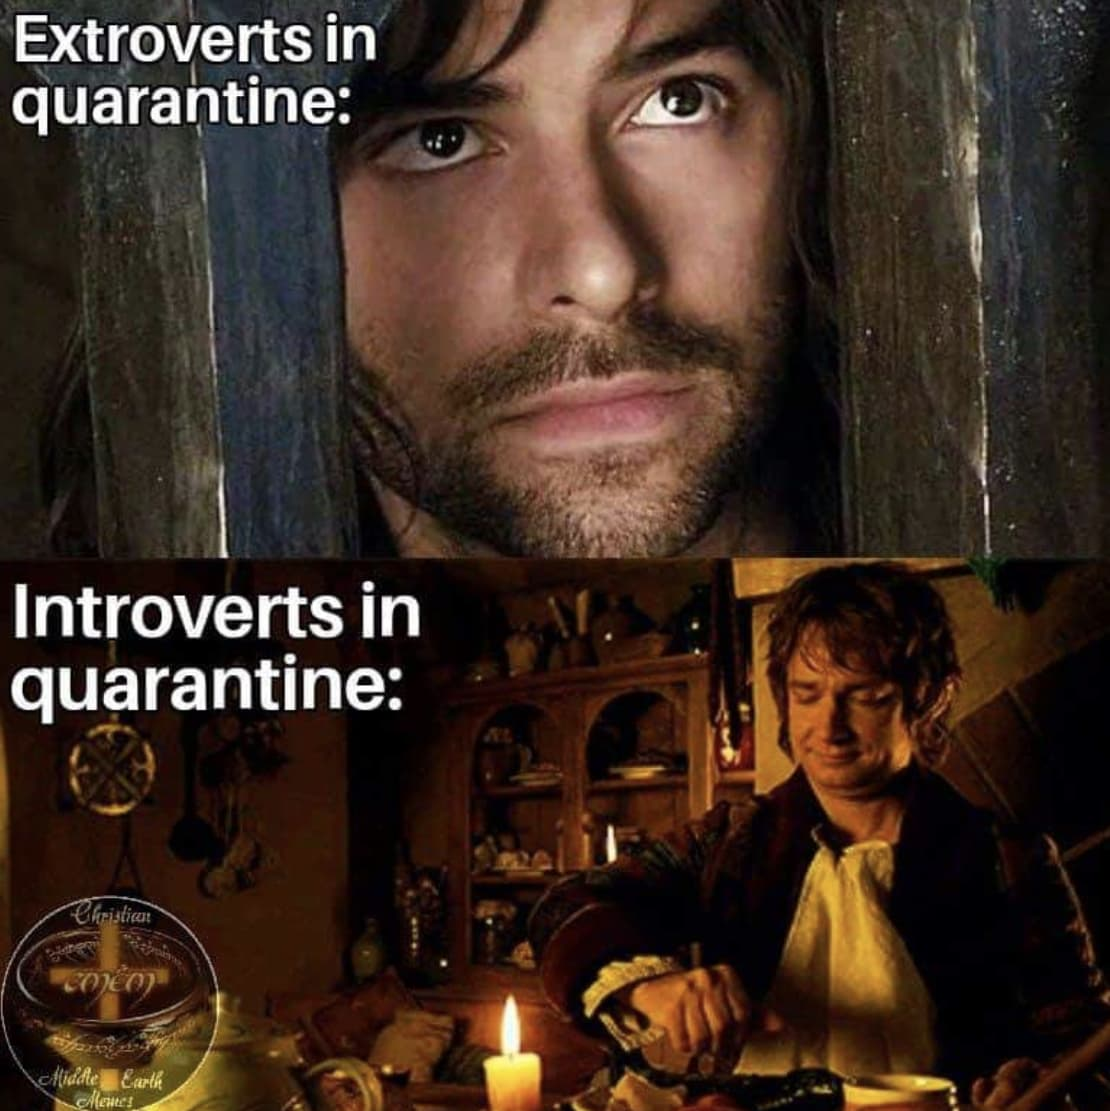 Random Funniest 'Lord of the Rings' Memes About Coronavirus